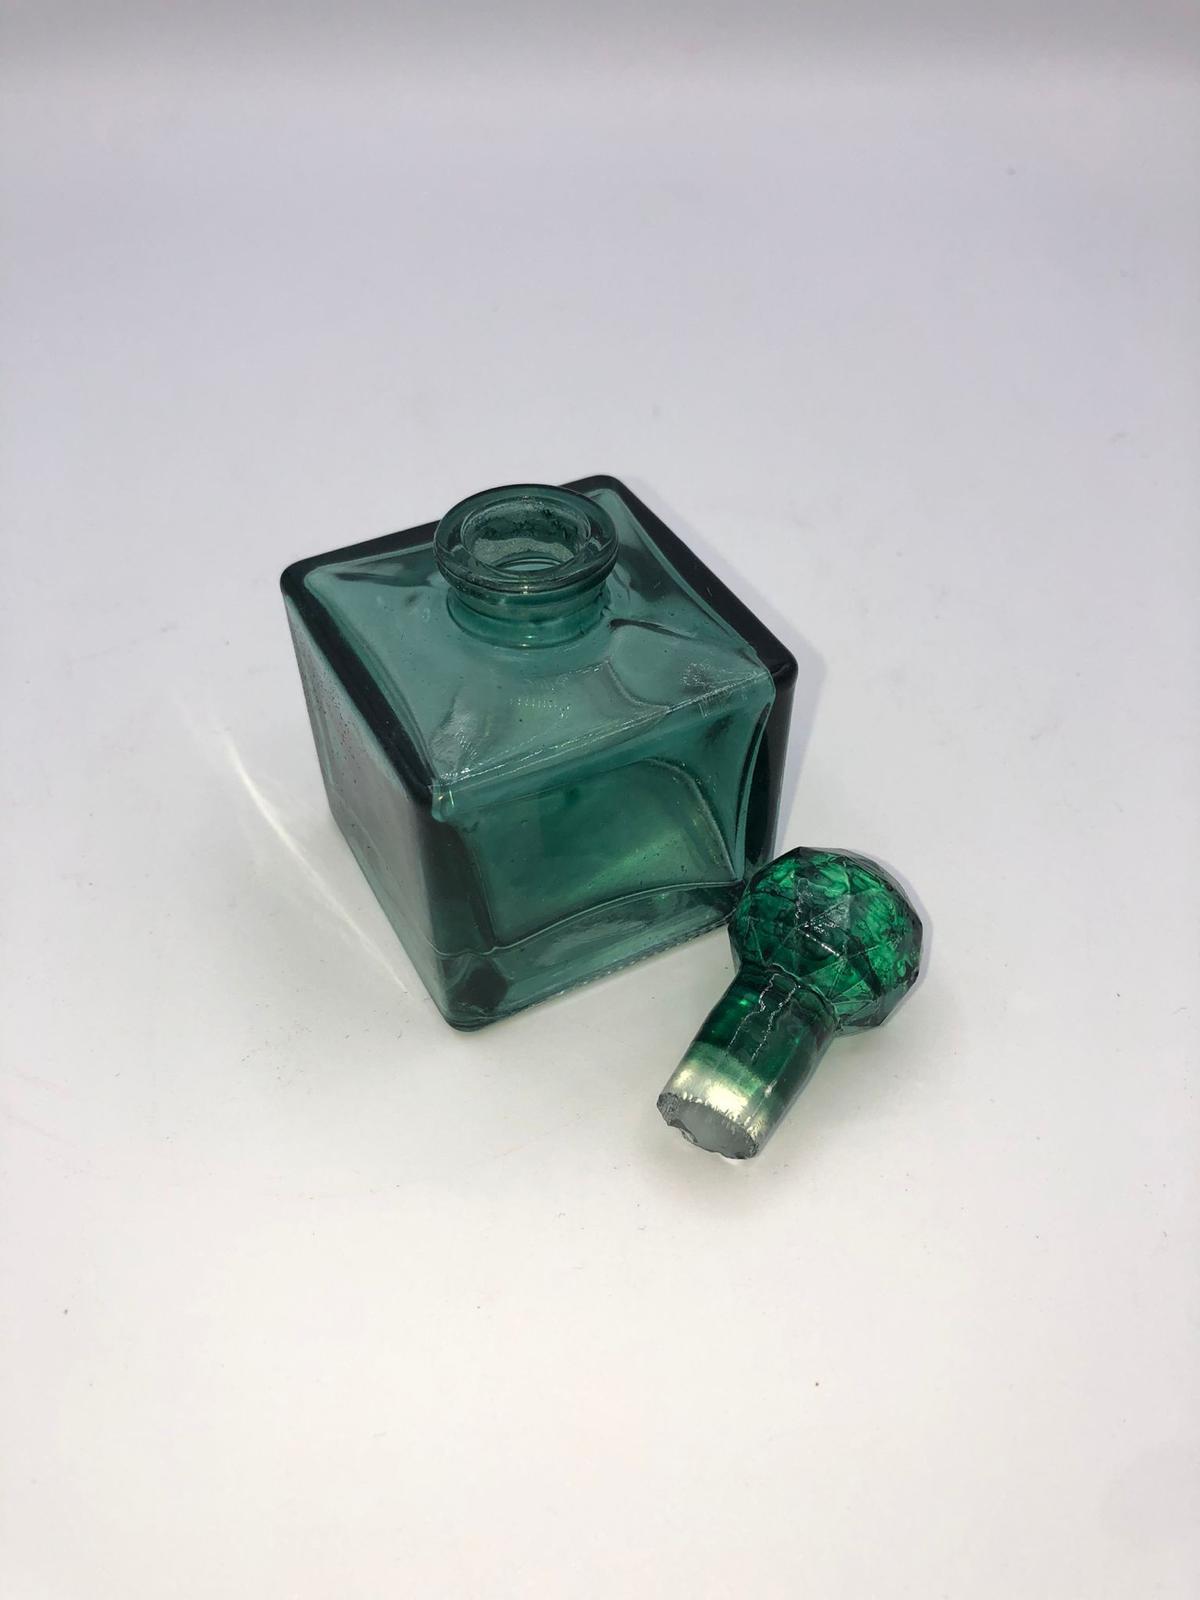 Frasco perfume verde cuadrado 2